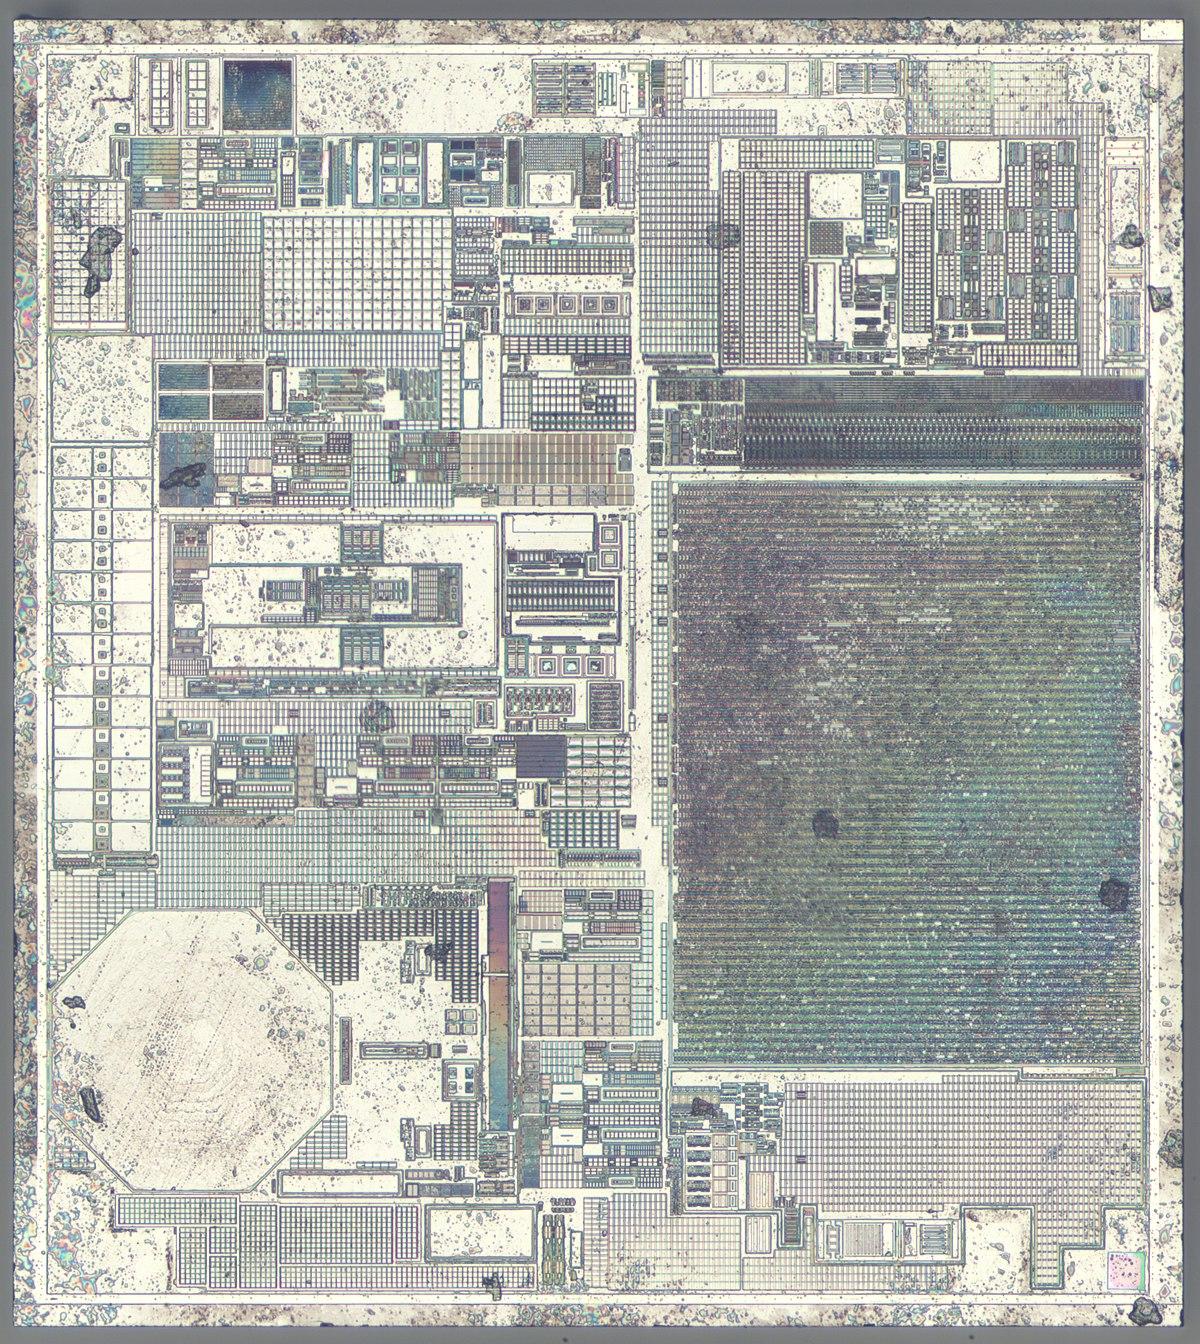 Nanoelectromechanical systems - Wikipedia